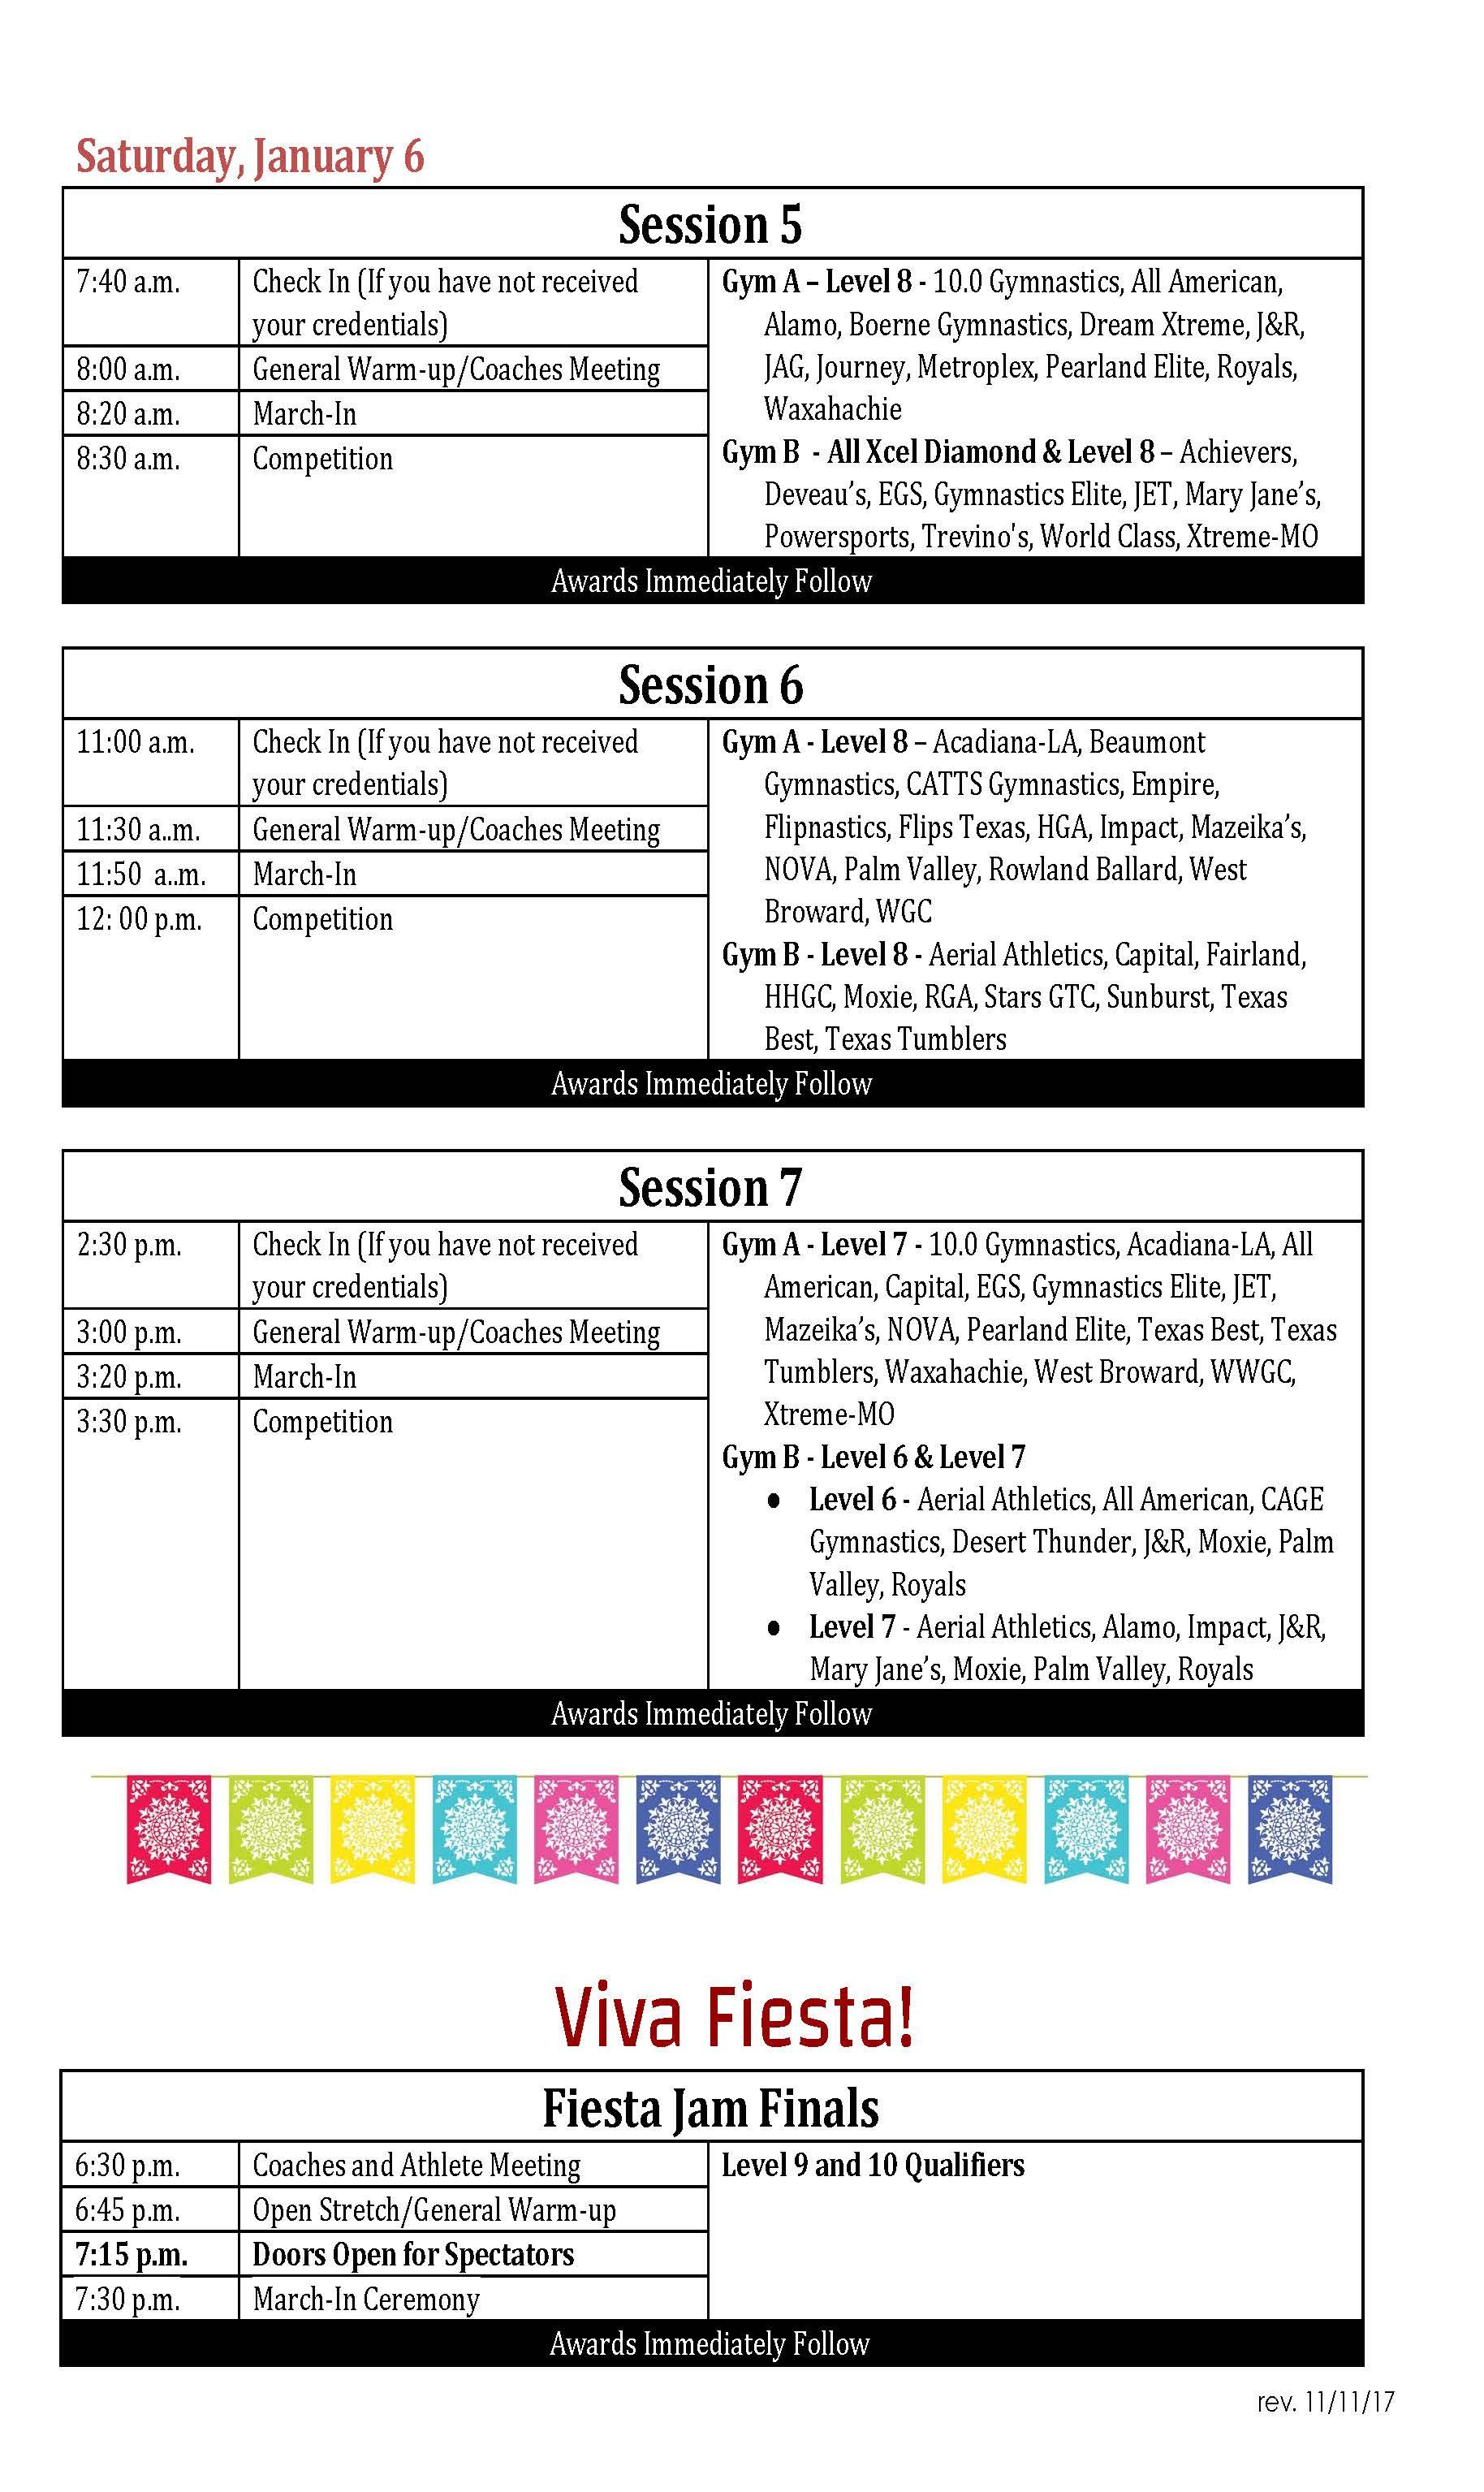 Alamo Classic 2018 Schedule JPG (rev. 11.11.17)_Page_2